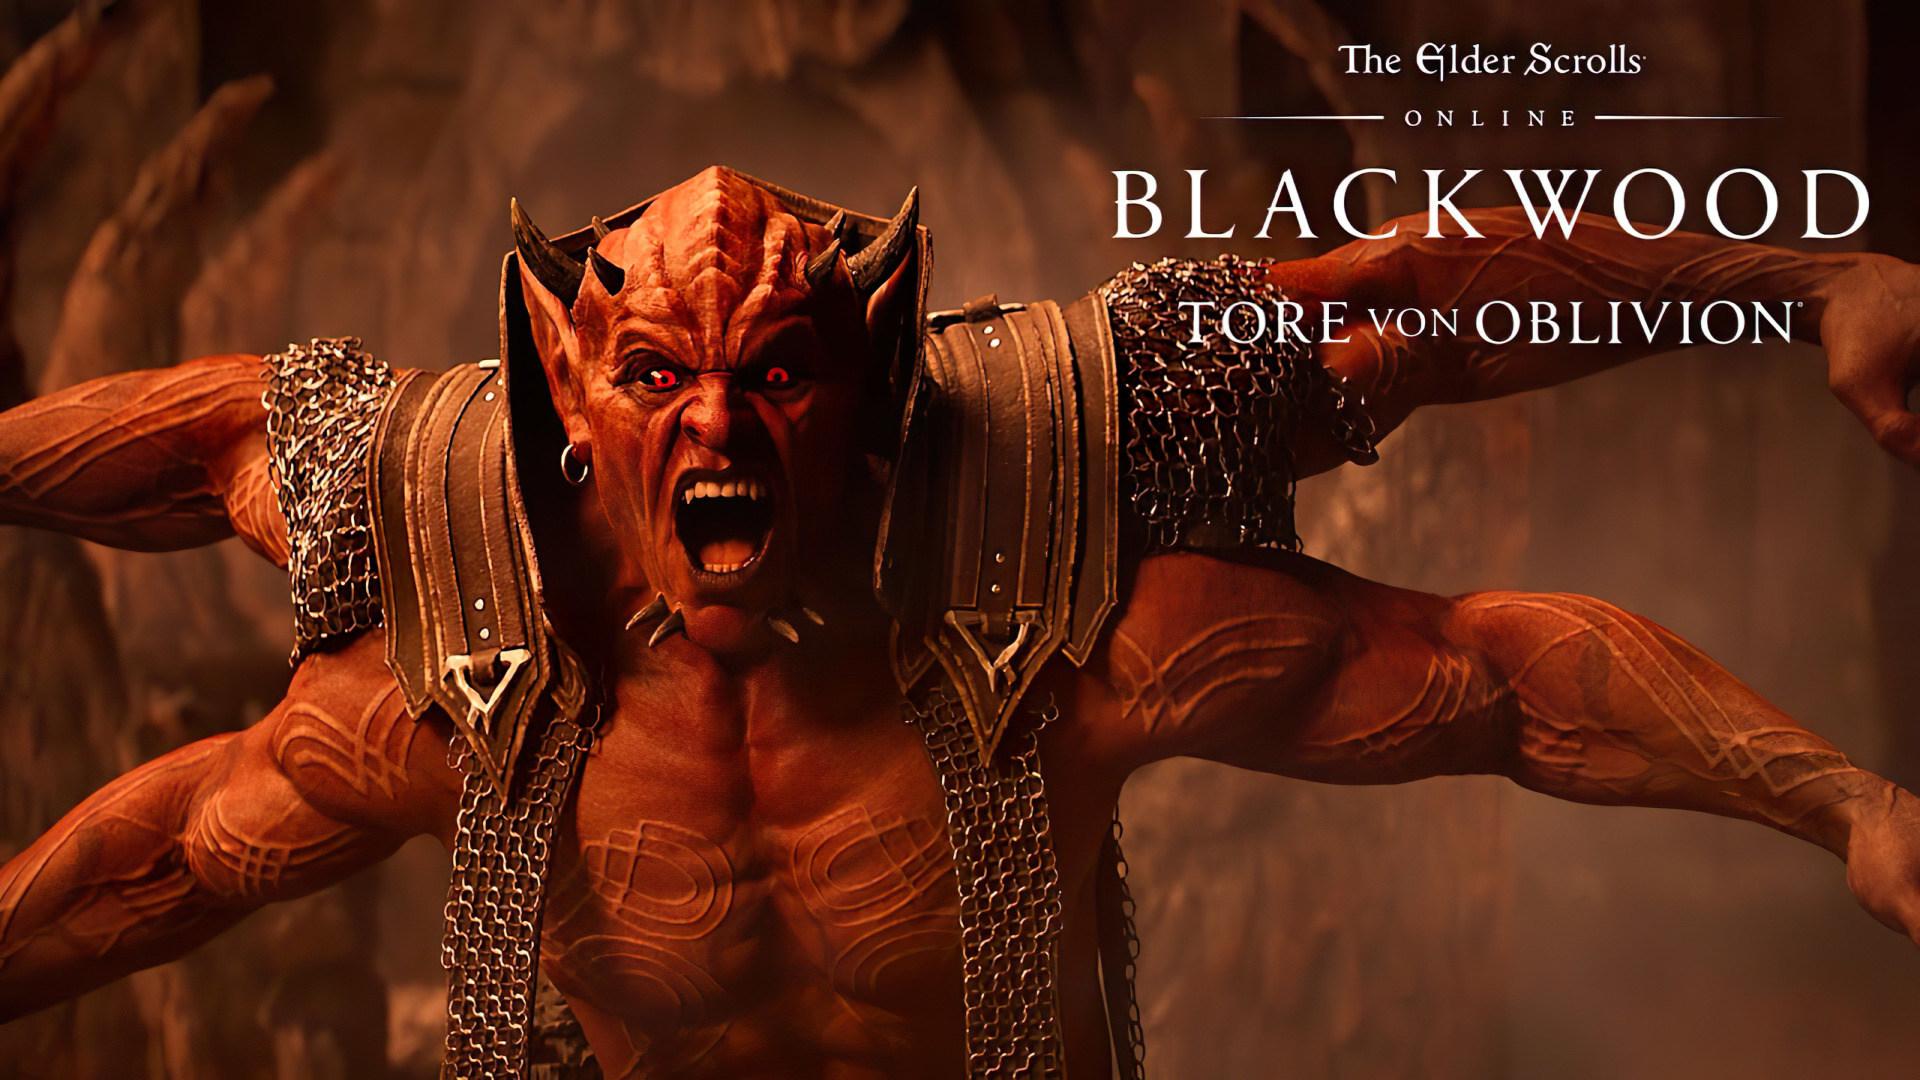 Trailer, Online-Spiele, Mmorpg, Mmo, Bethesda, Online-Rollenspiel, The Elder Scrolls Online, Bethesda Softworks, The Elder Scrolls, Teso, Blackwood, The Elder Scrolls Online: Blackwood